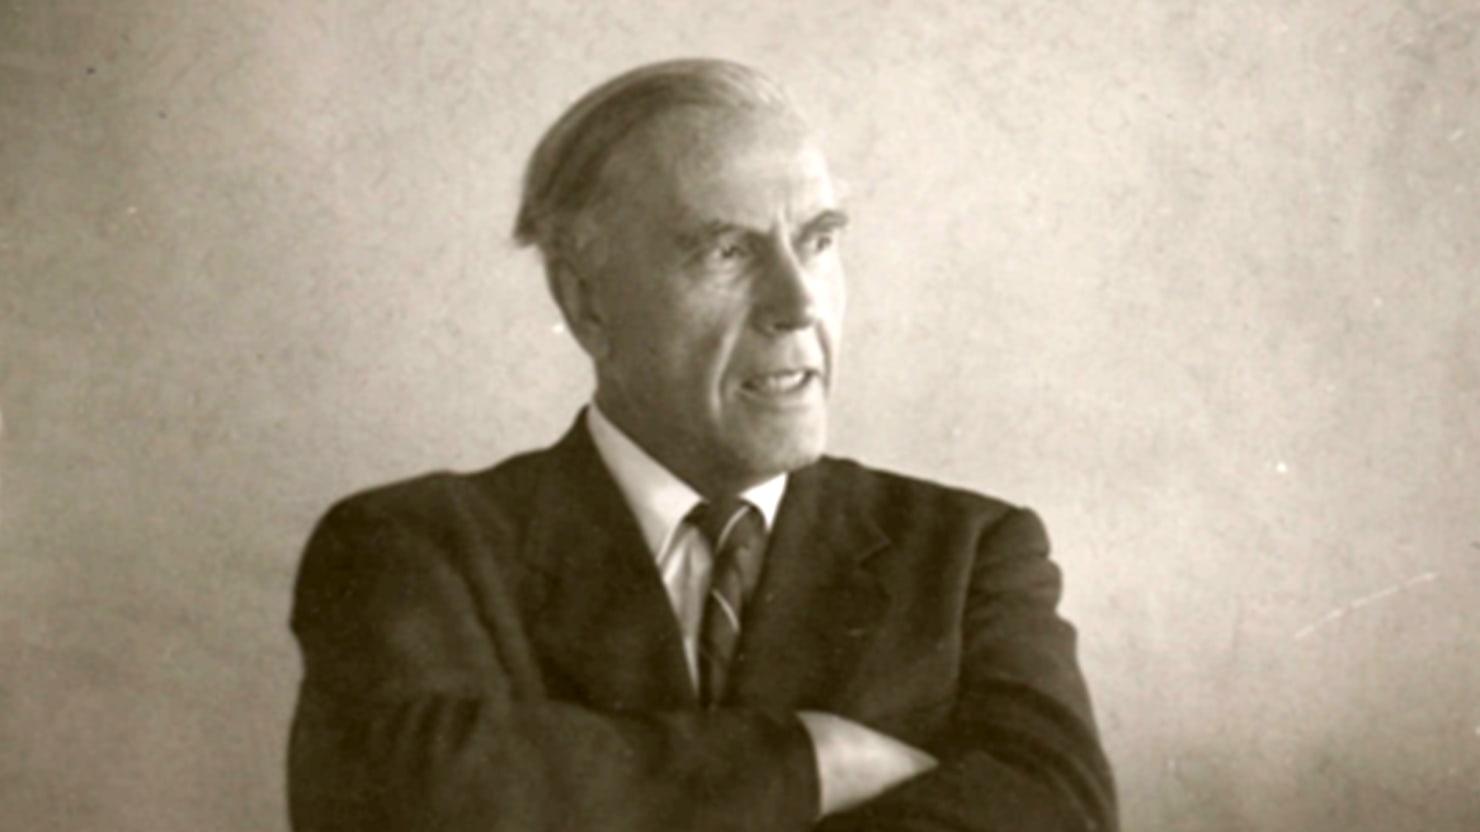 The Catholic Philosopher Who Took on Hitler